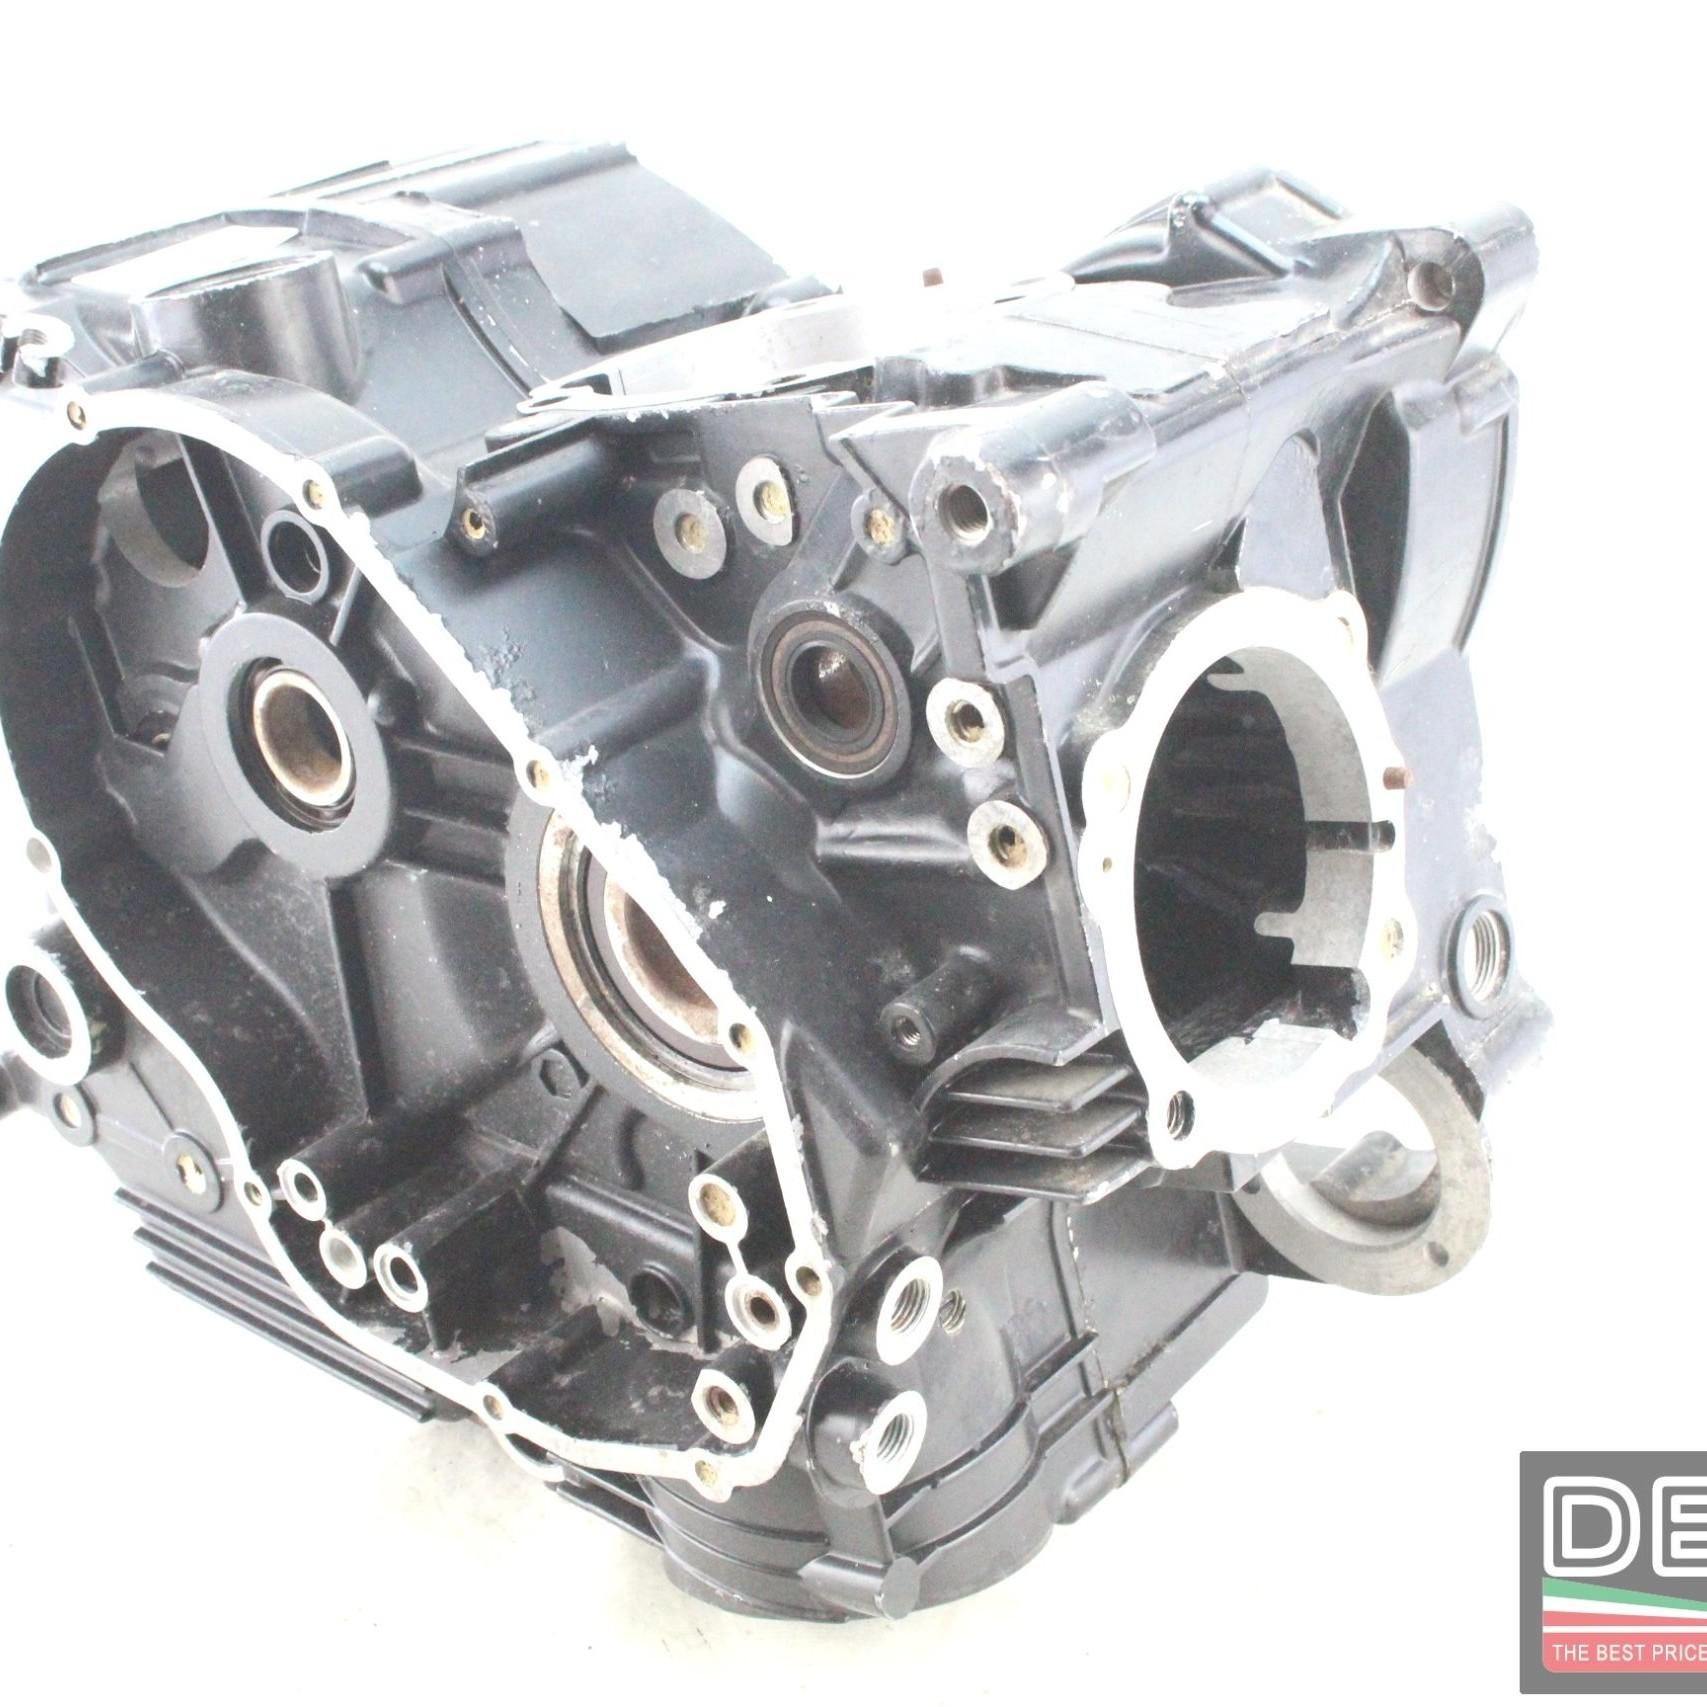 Casse carter motore Ducati Pantah Elephant 500 650